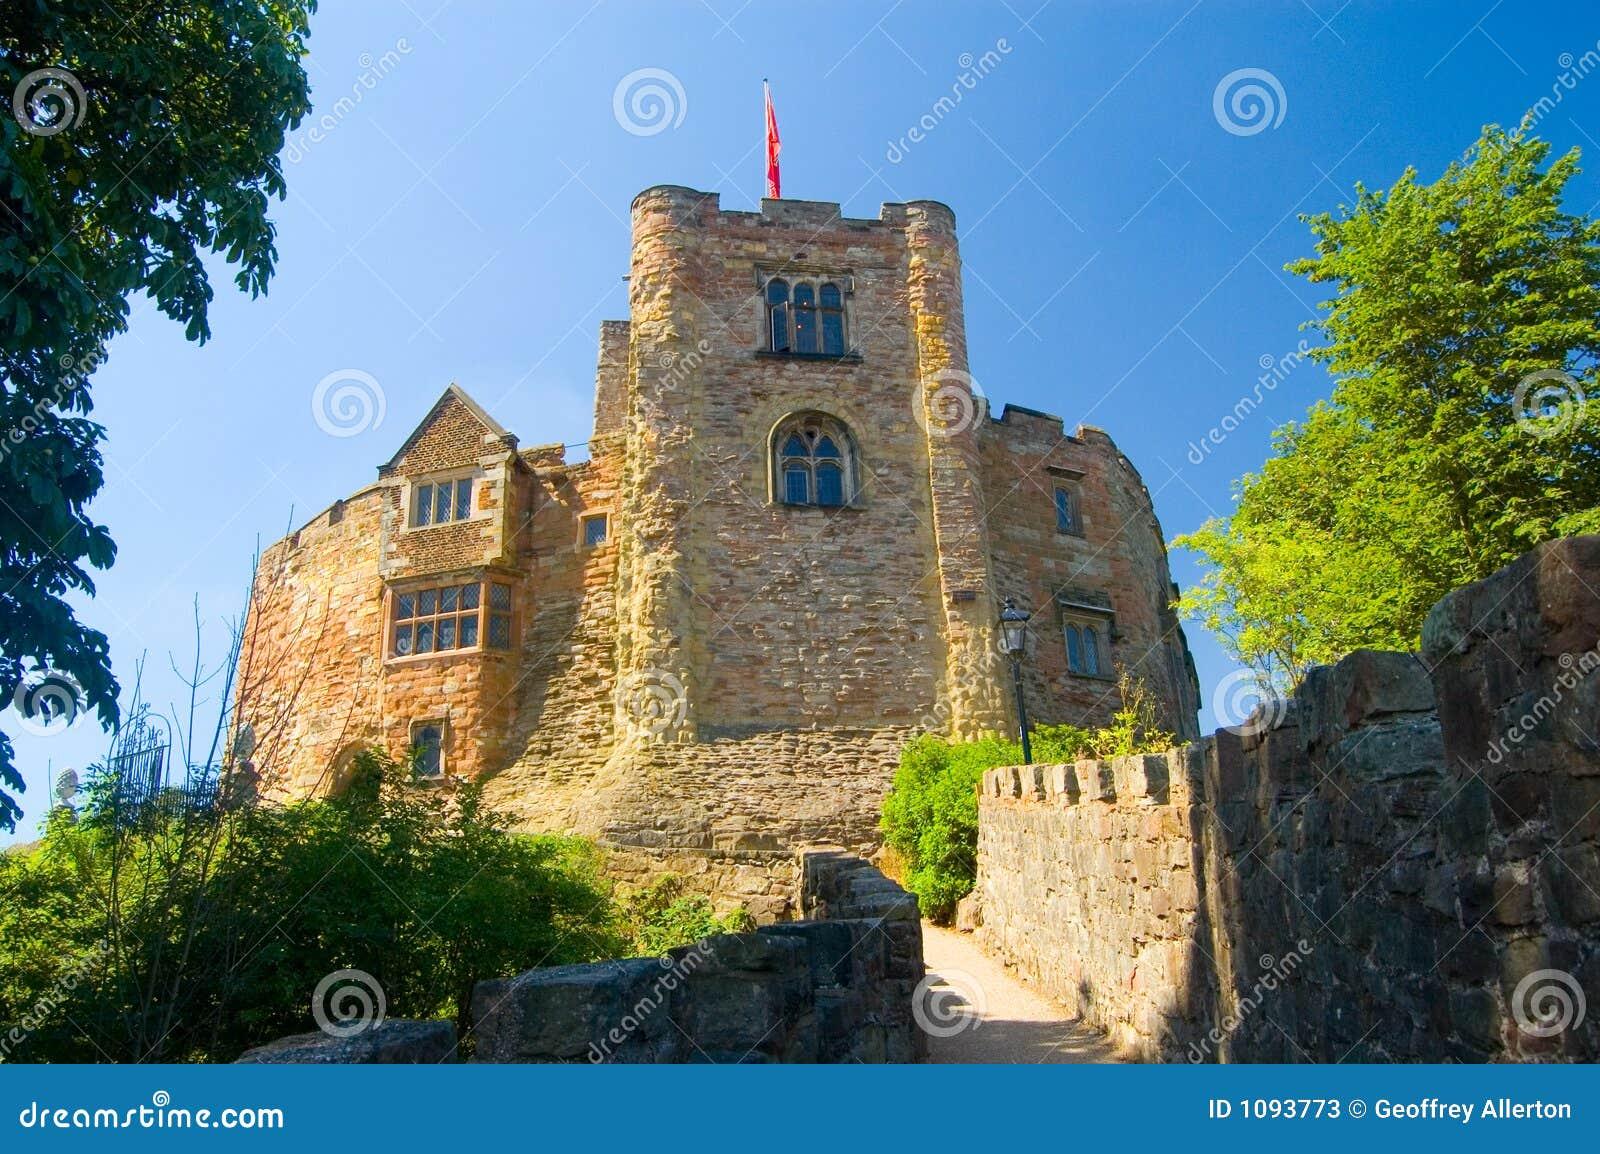 Tamworth castle in the summer sun stock photos image for Sun castle